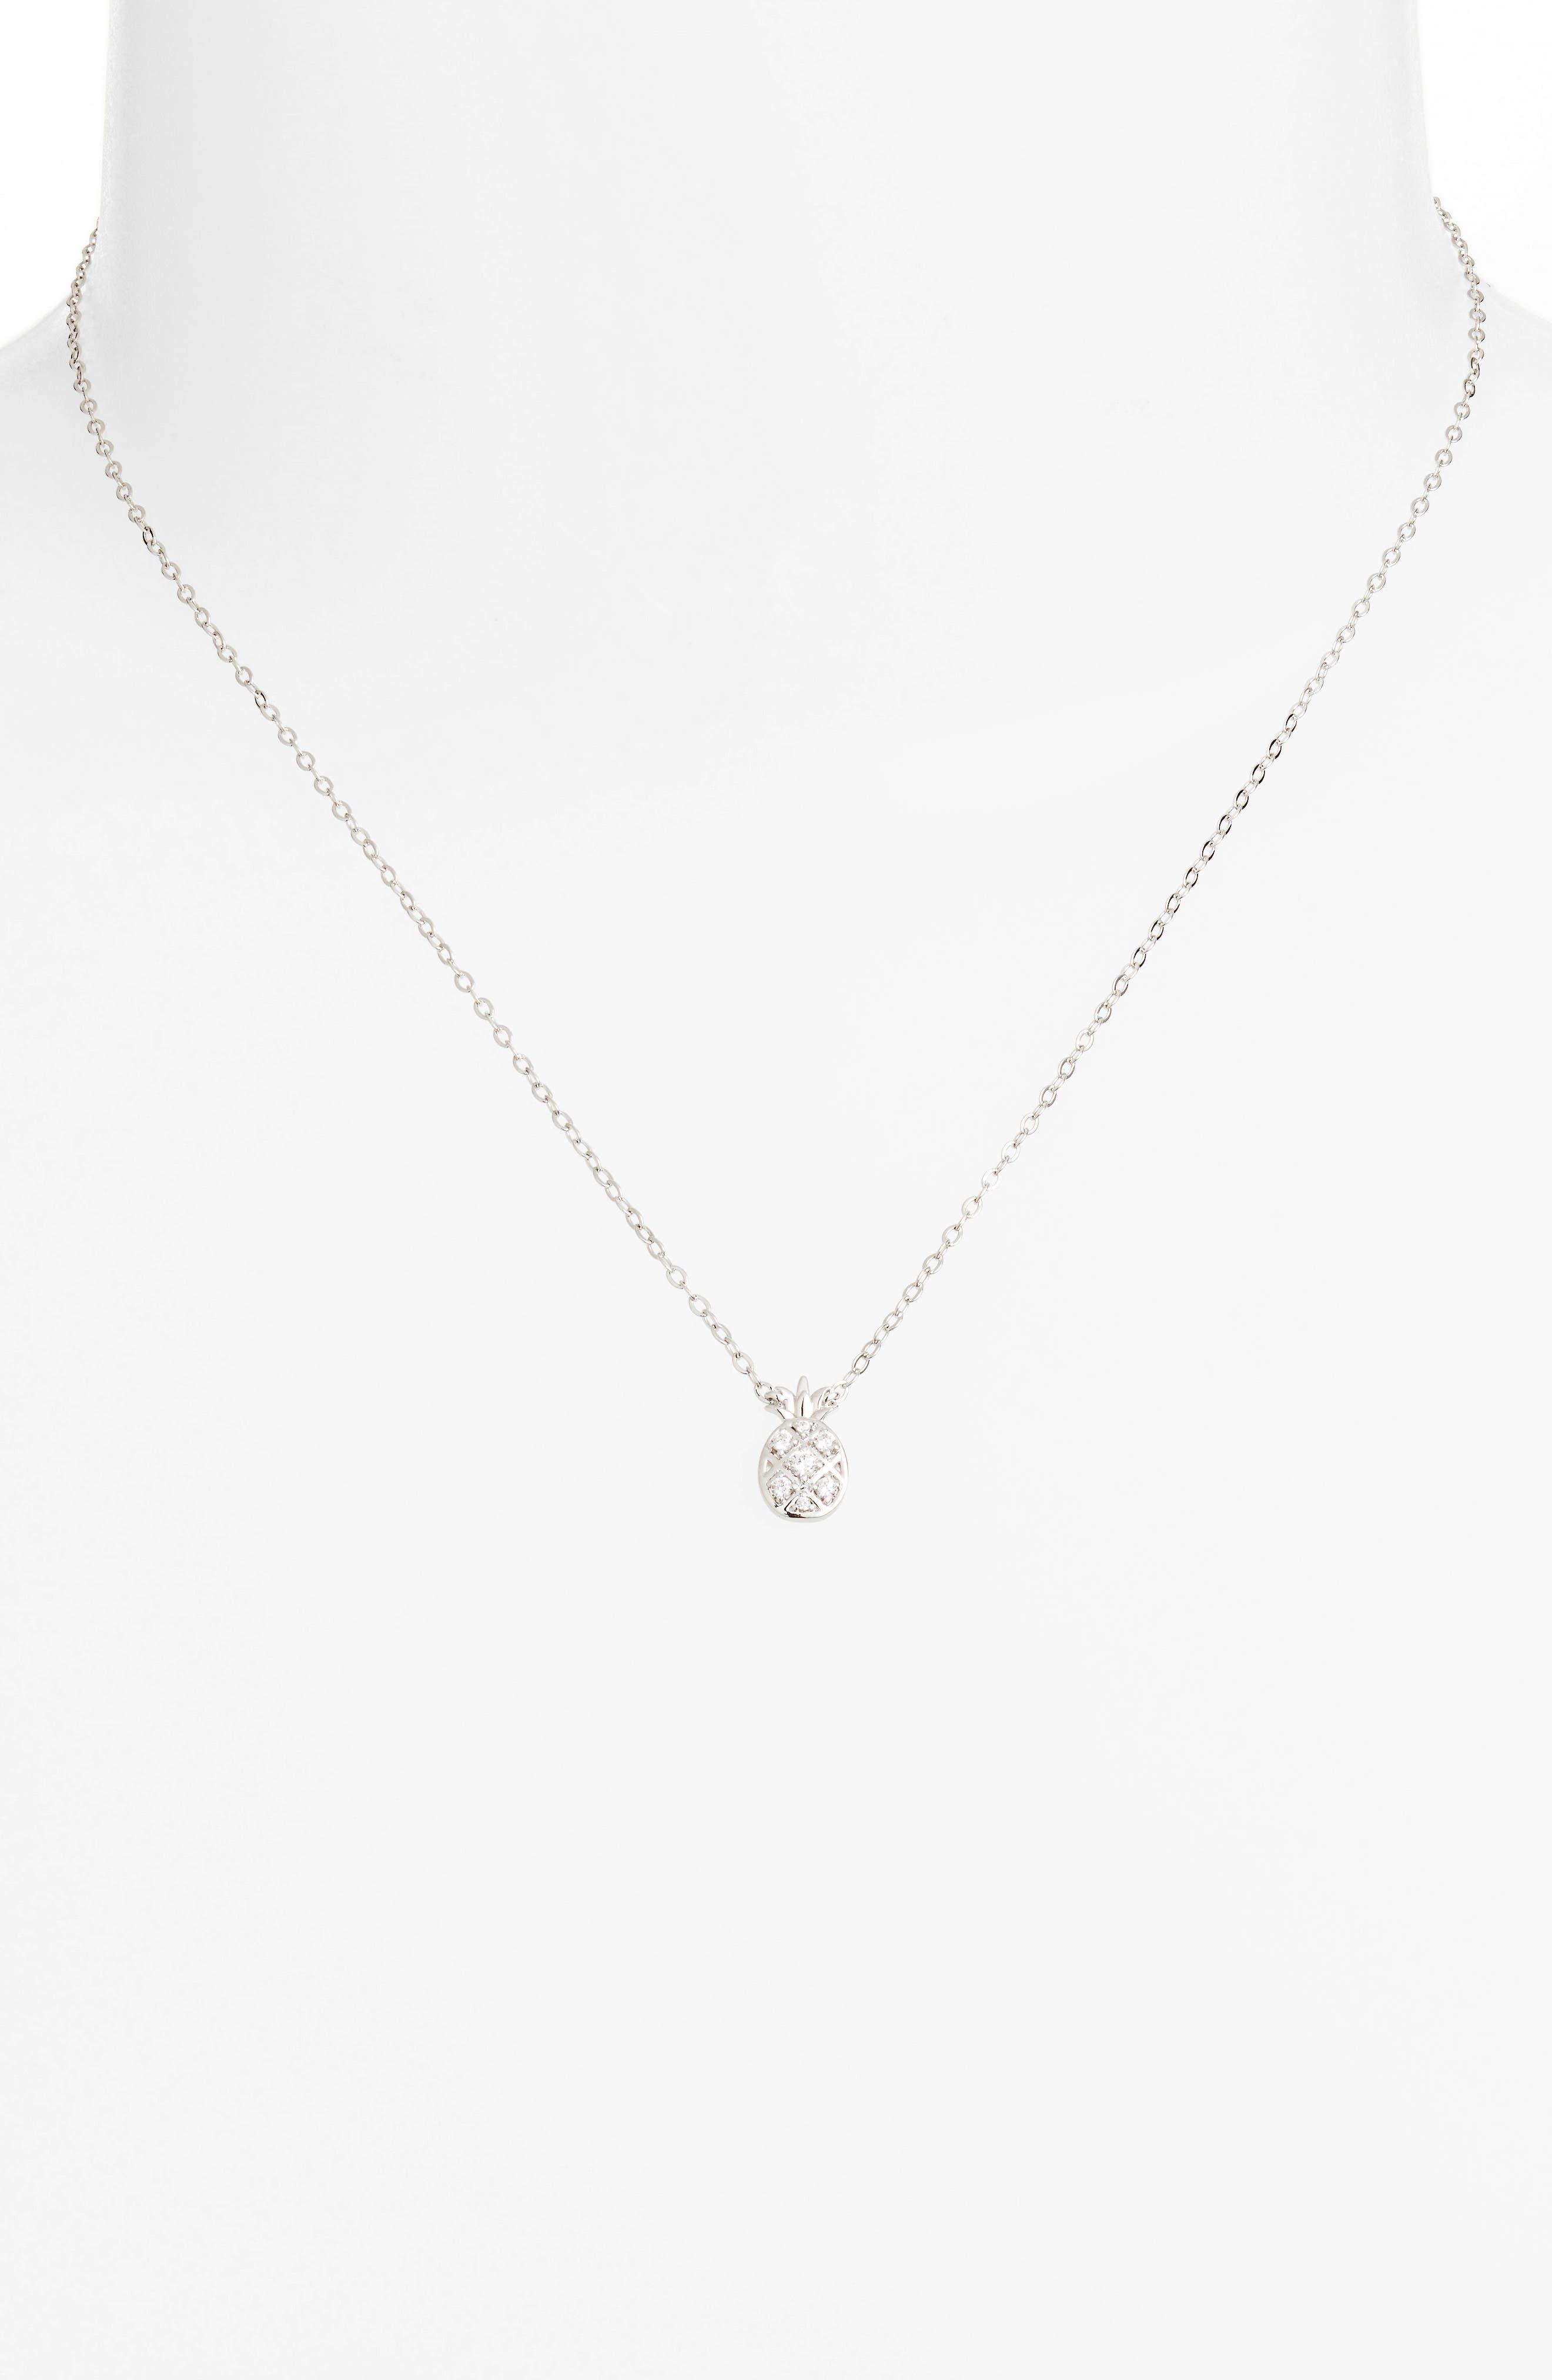 Reminisce Cubic Zirconia Pineapple Pendant Necklace,                             Alternate thumbnail 2, color,                             040